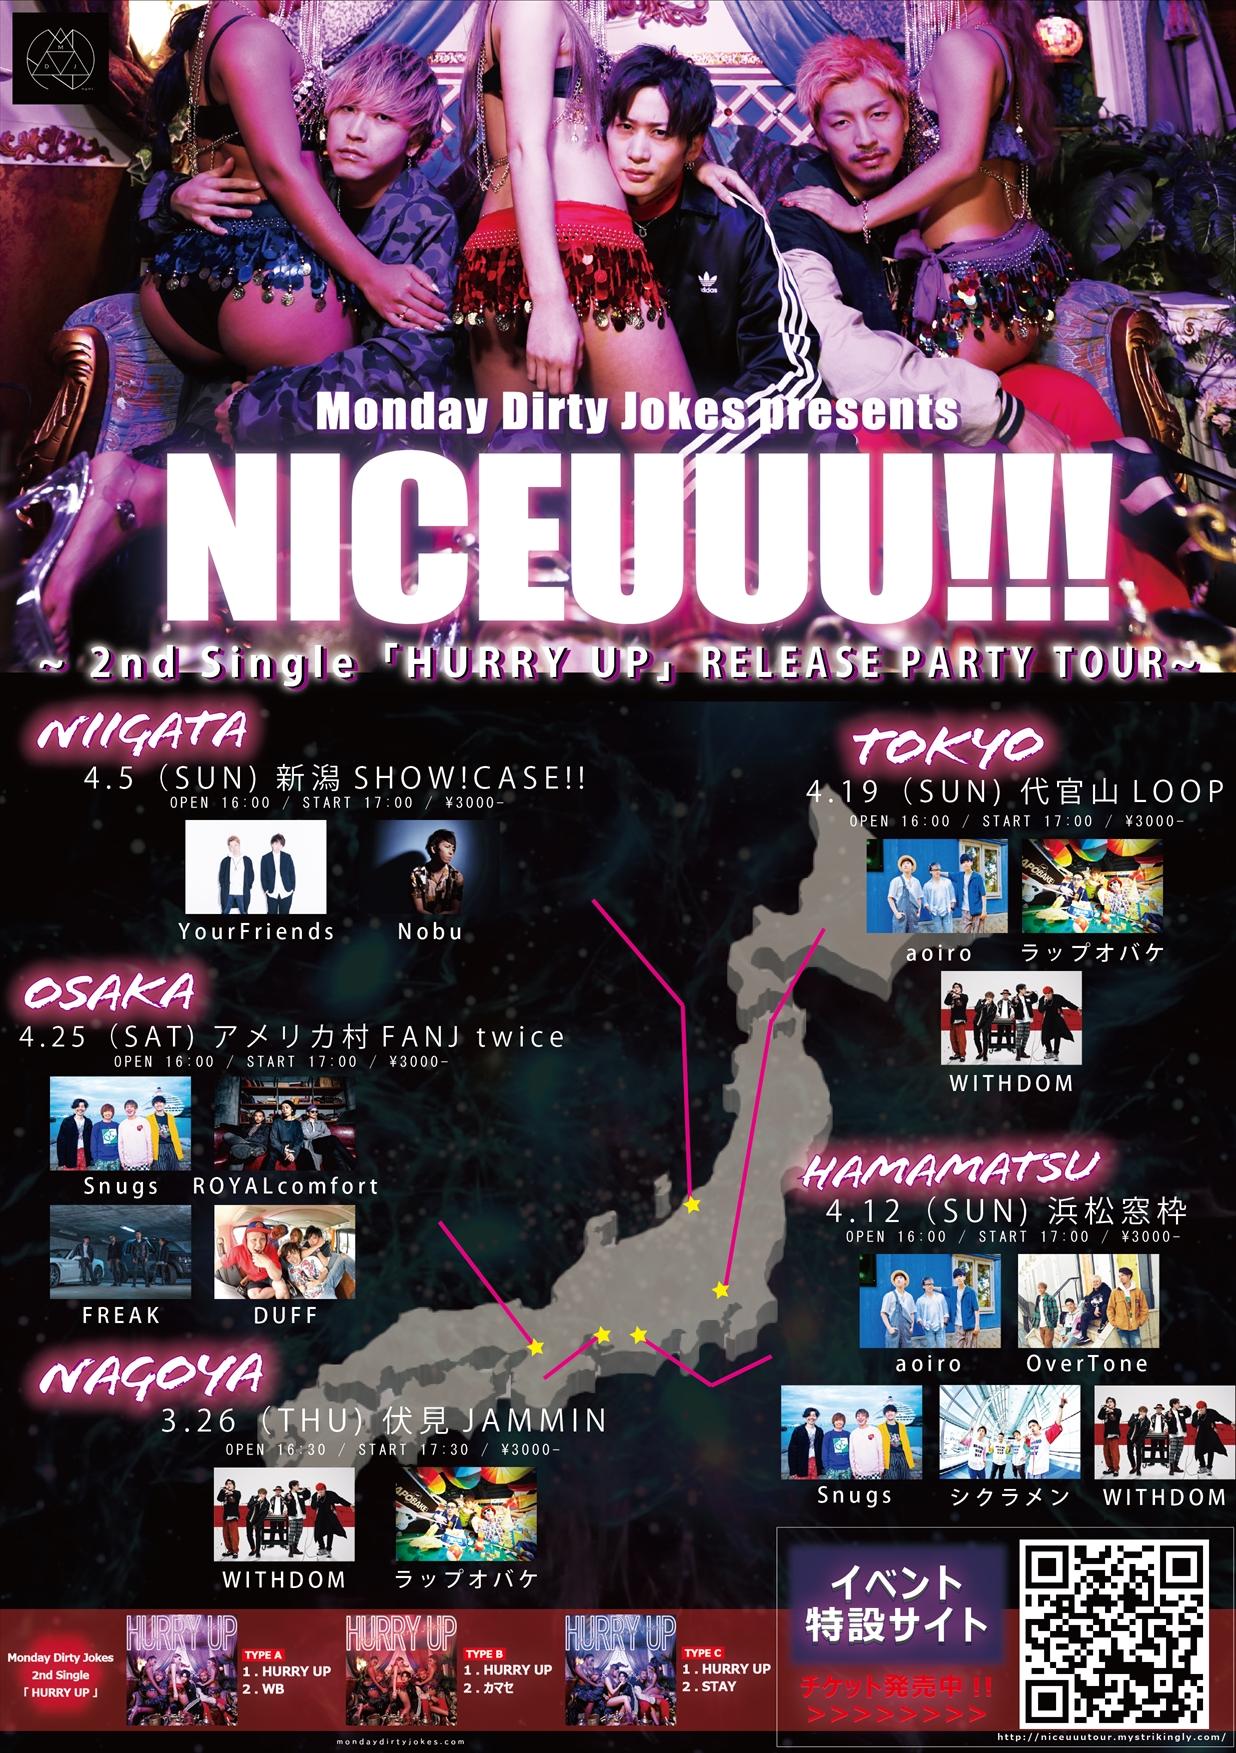 Monday Dirty Jokes 「NICEUUU!!!~HURRY UP RELEASE TOURS~」 @FANJ twice